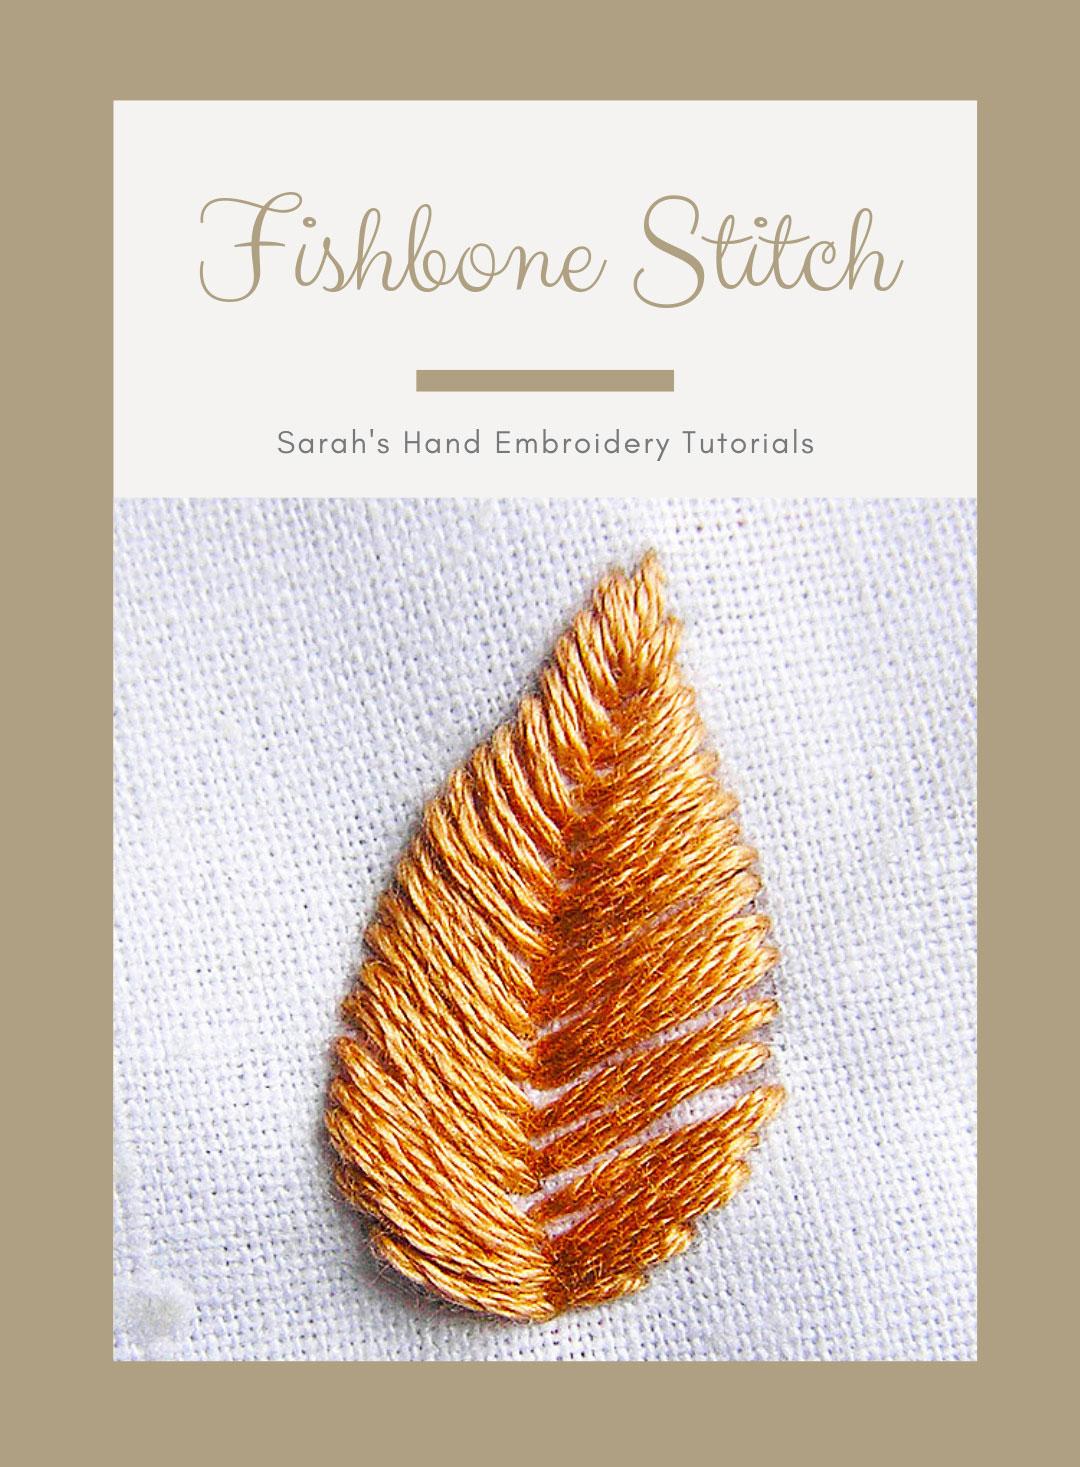 How to do Fishbone Stitch   Sarah's Hand Embroidery Tutorials